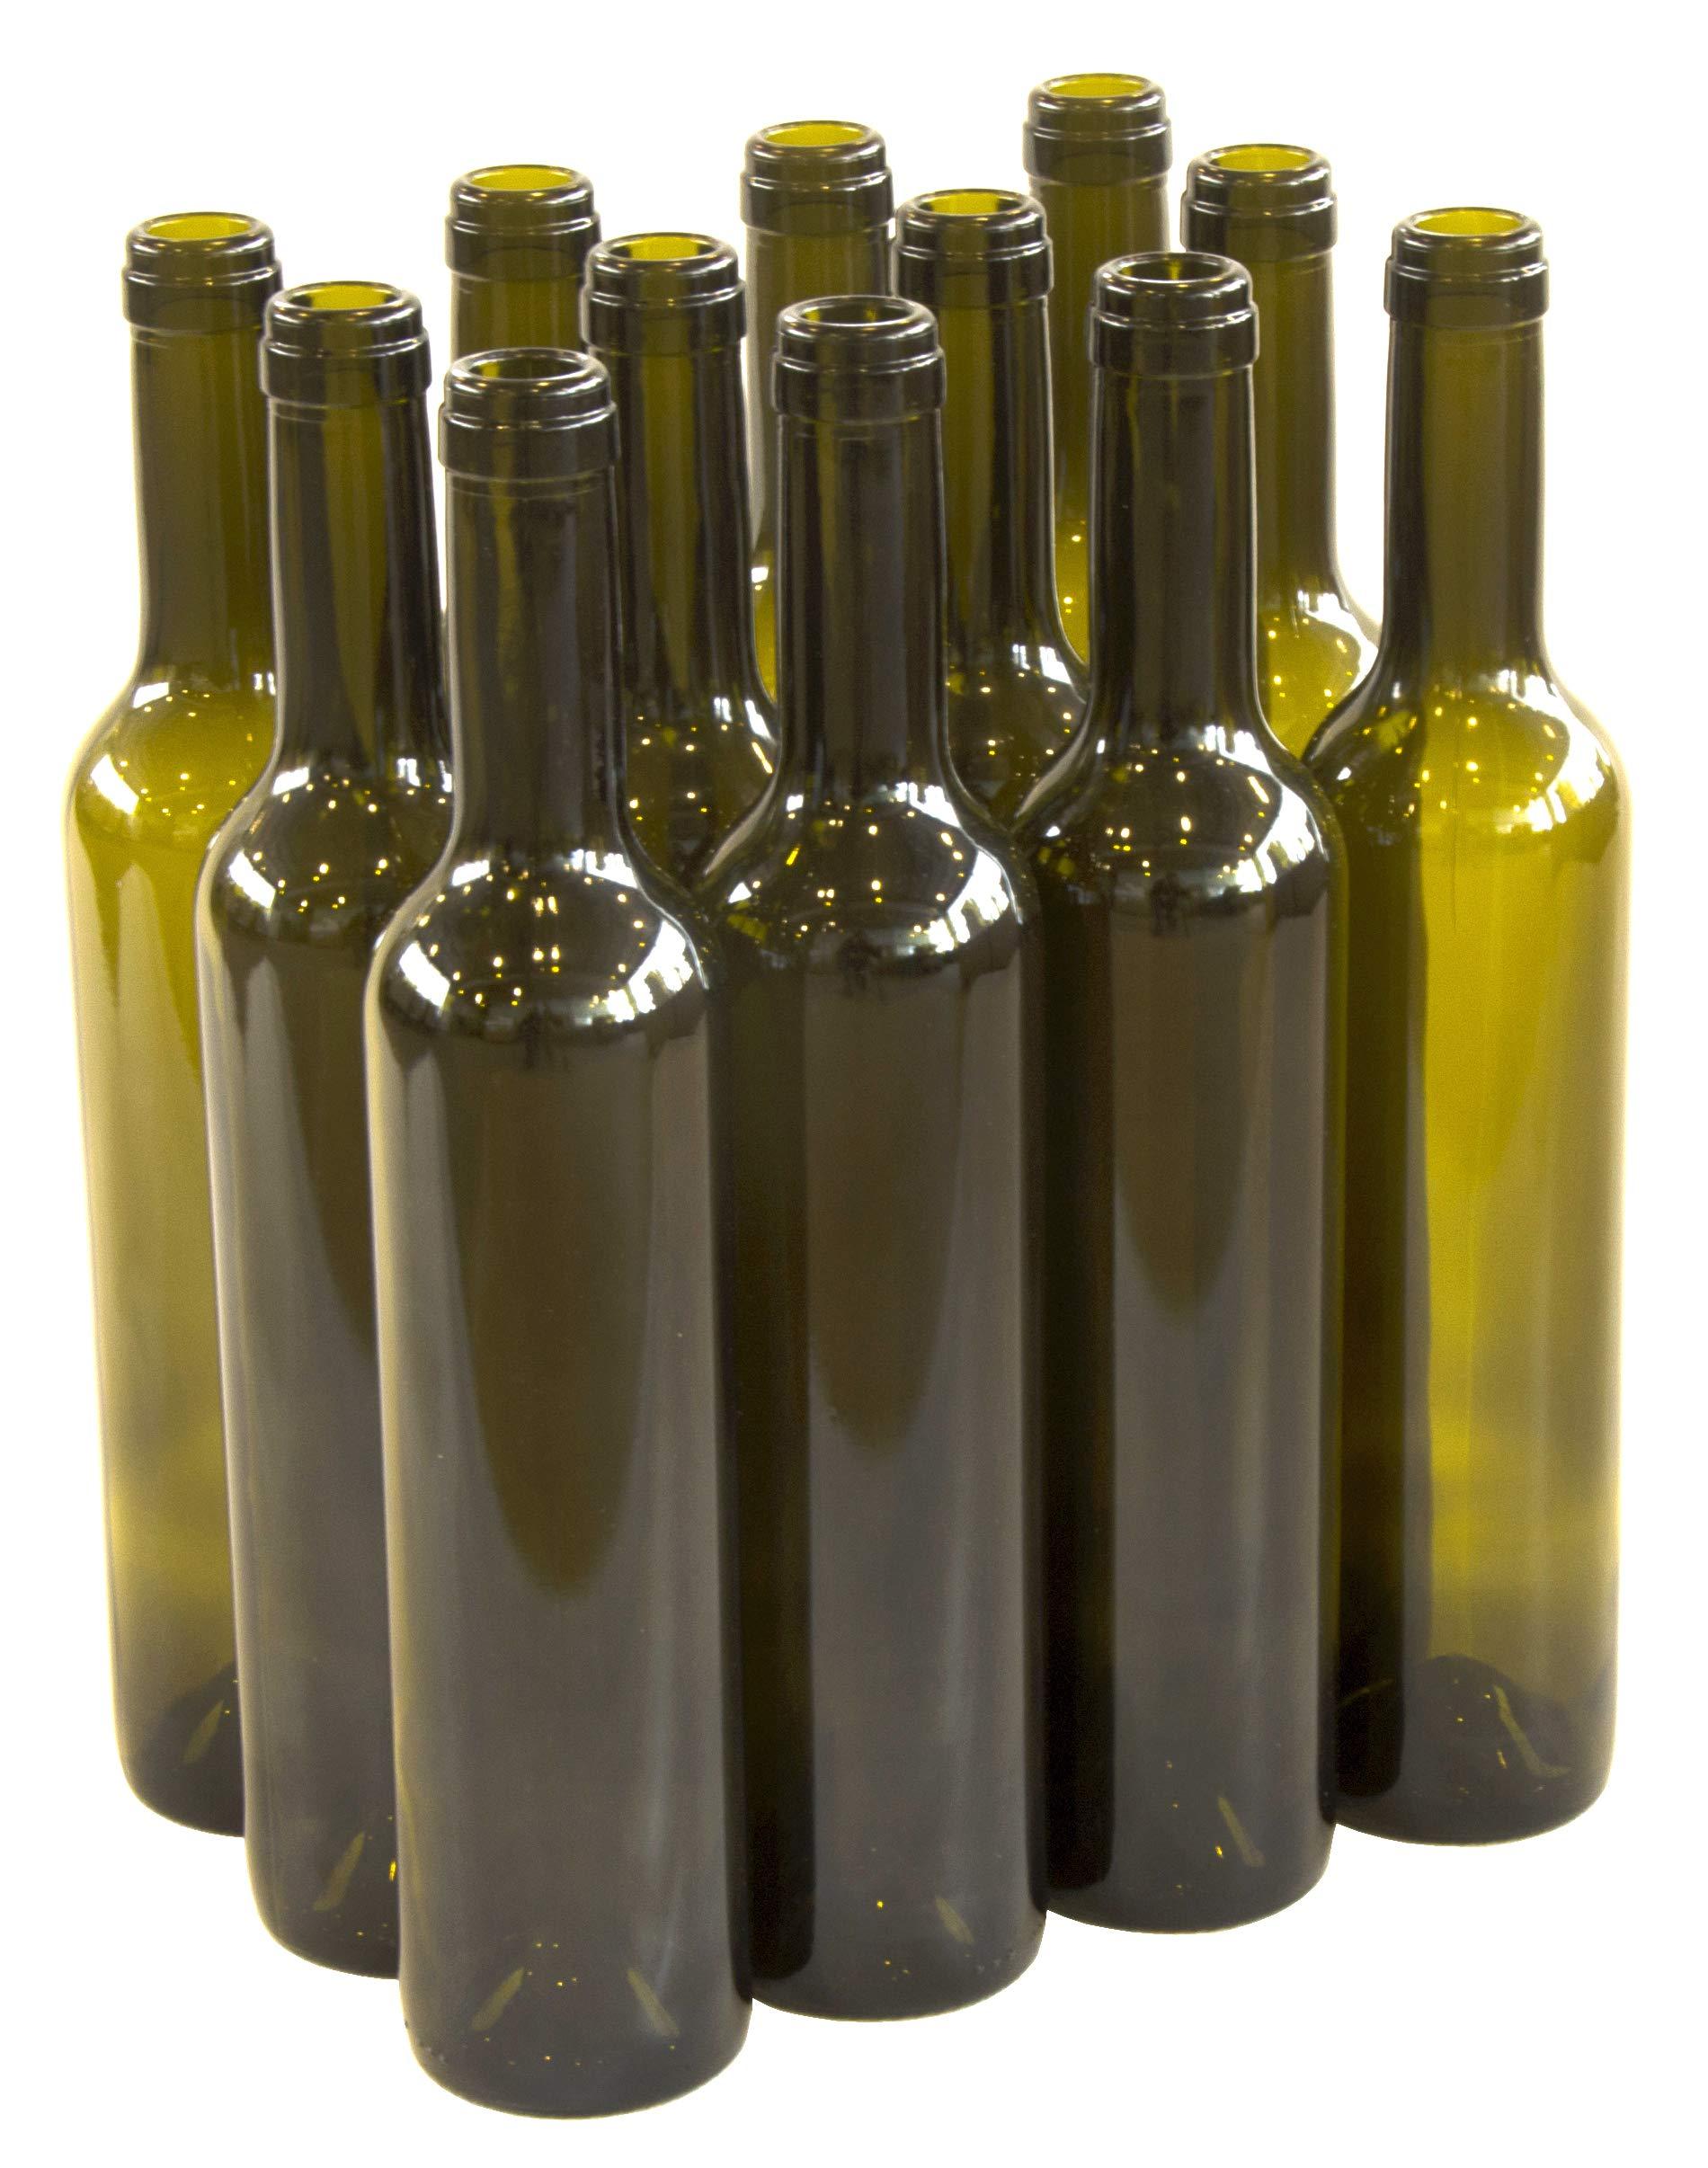 North Mountain Supply 500ml Antique Green Glass Bordelaise Seduction Wine Bottle Punt-Bottom Cork Finish - Case of 12